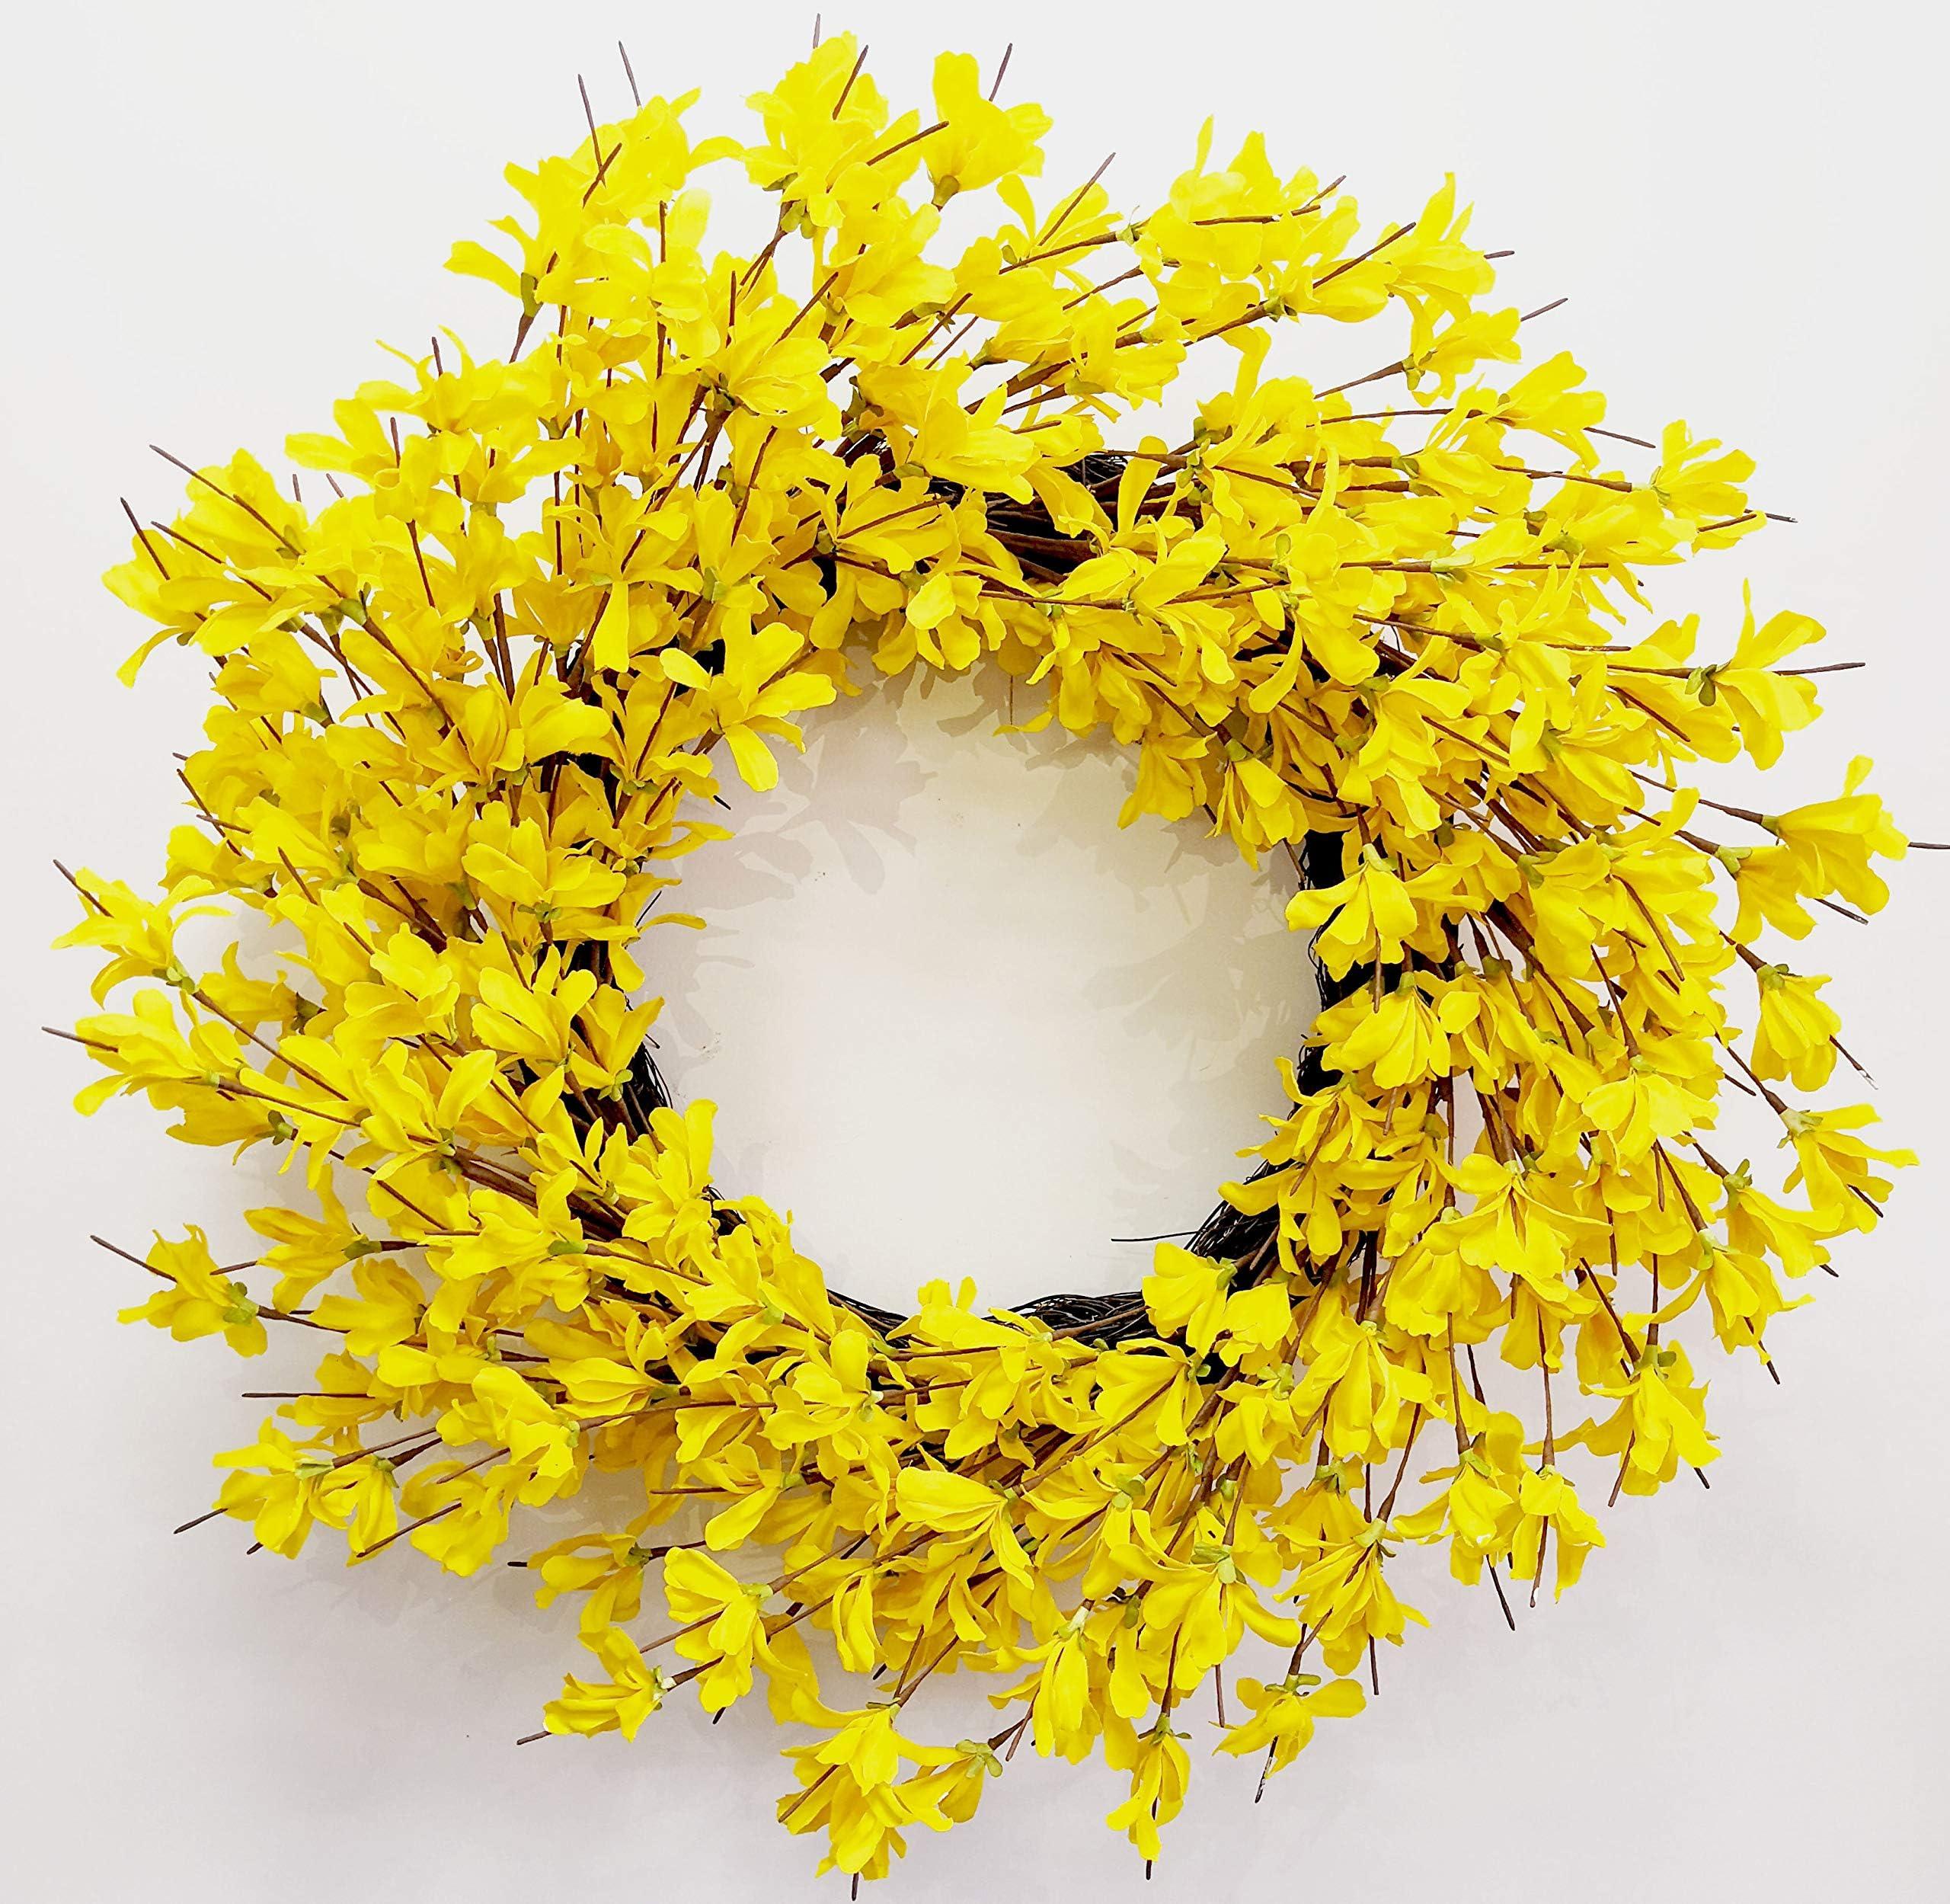 Yellow Forsythia Wreath Gift. Summer Wreath Yellow Wreath Front door Wreath Grapevine Wreath Spring Wreath Spiral Wreath